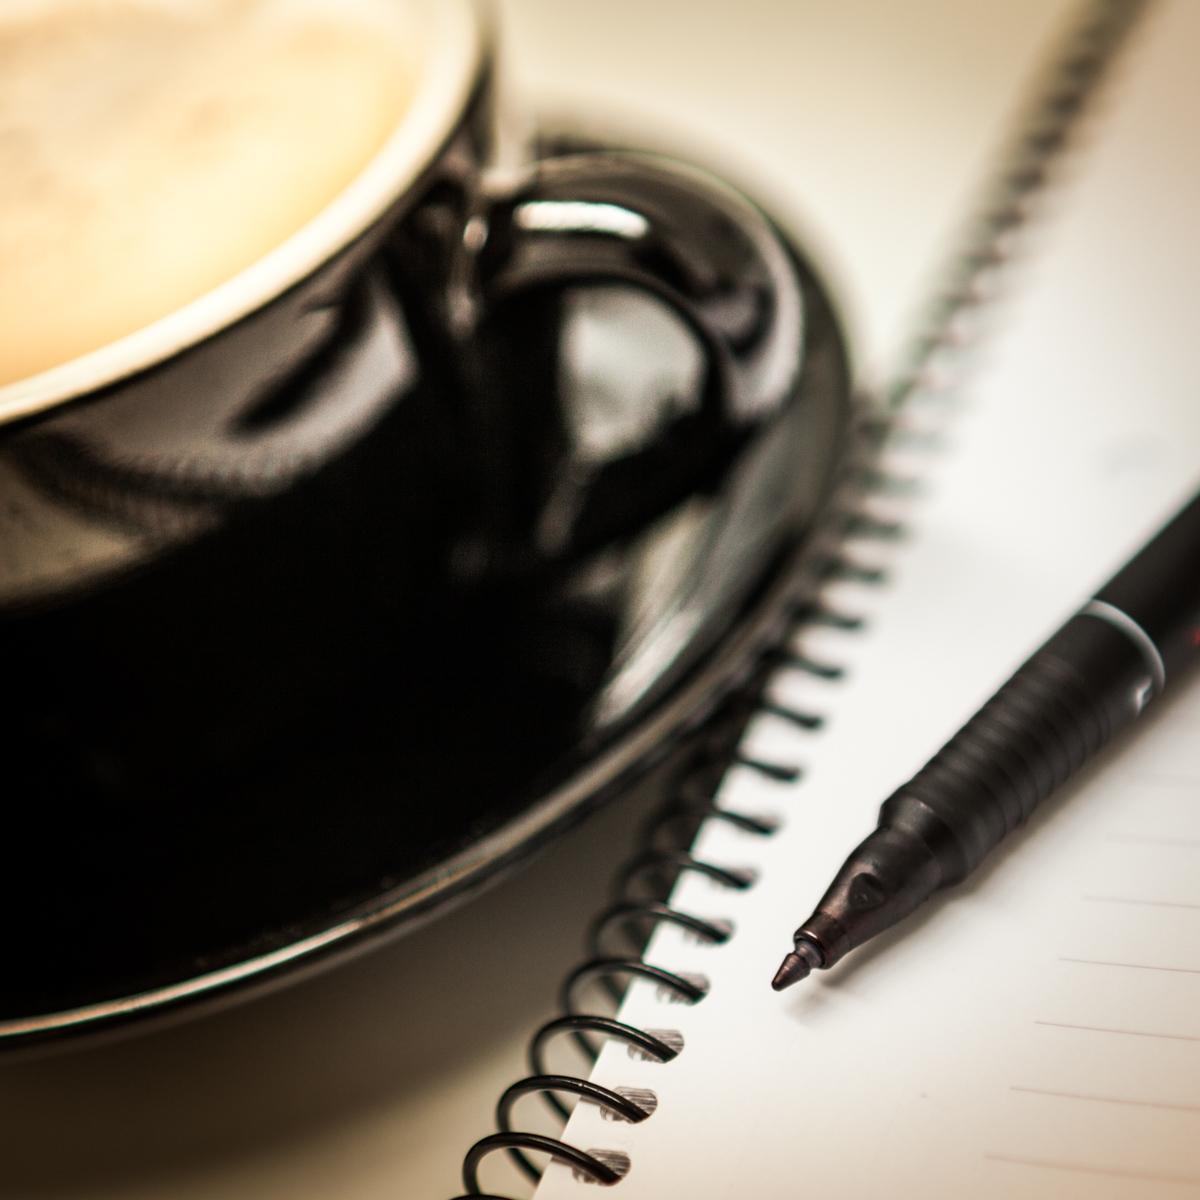 blog_pen_coffee.jpg